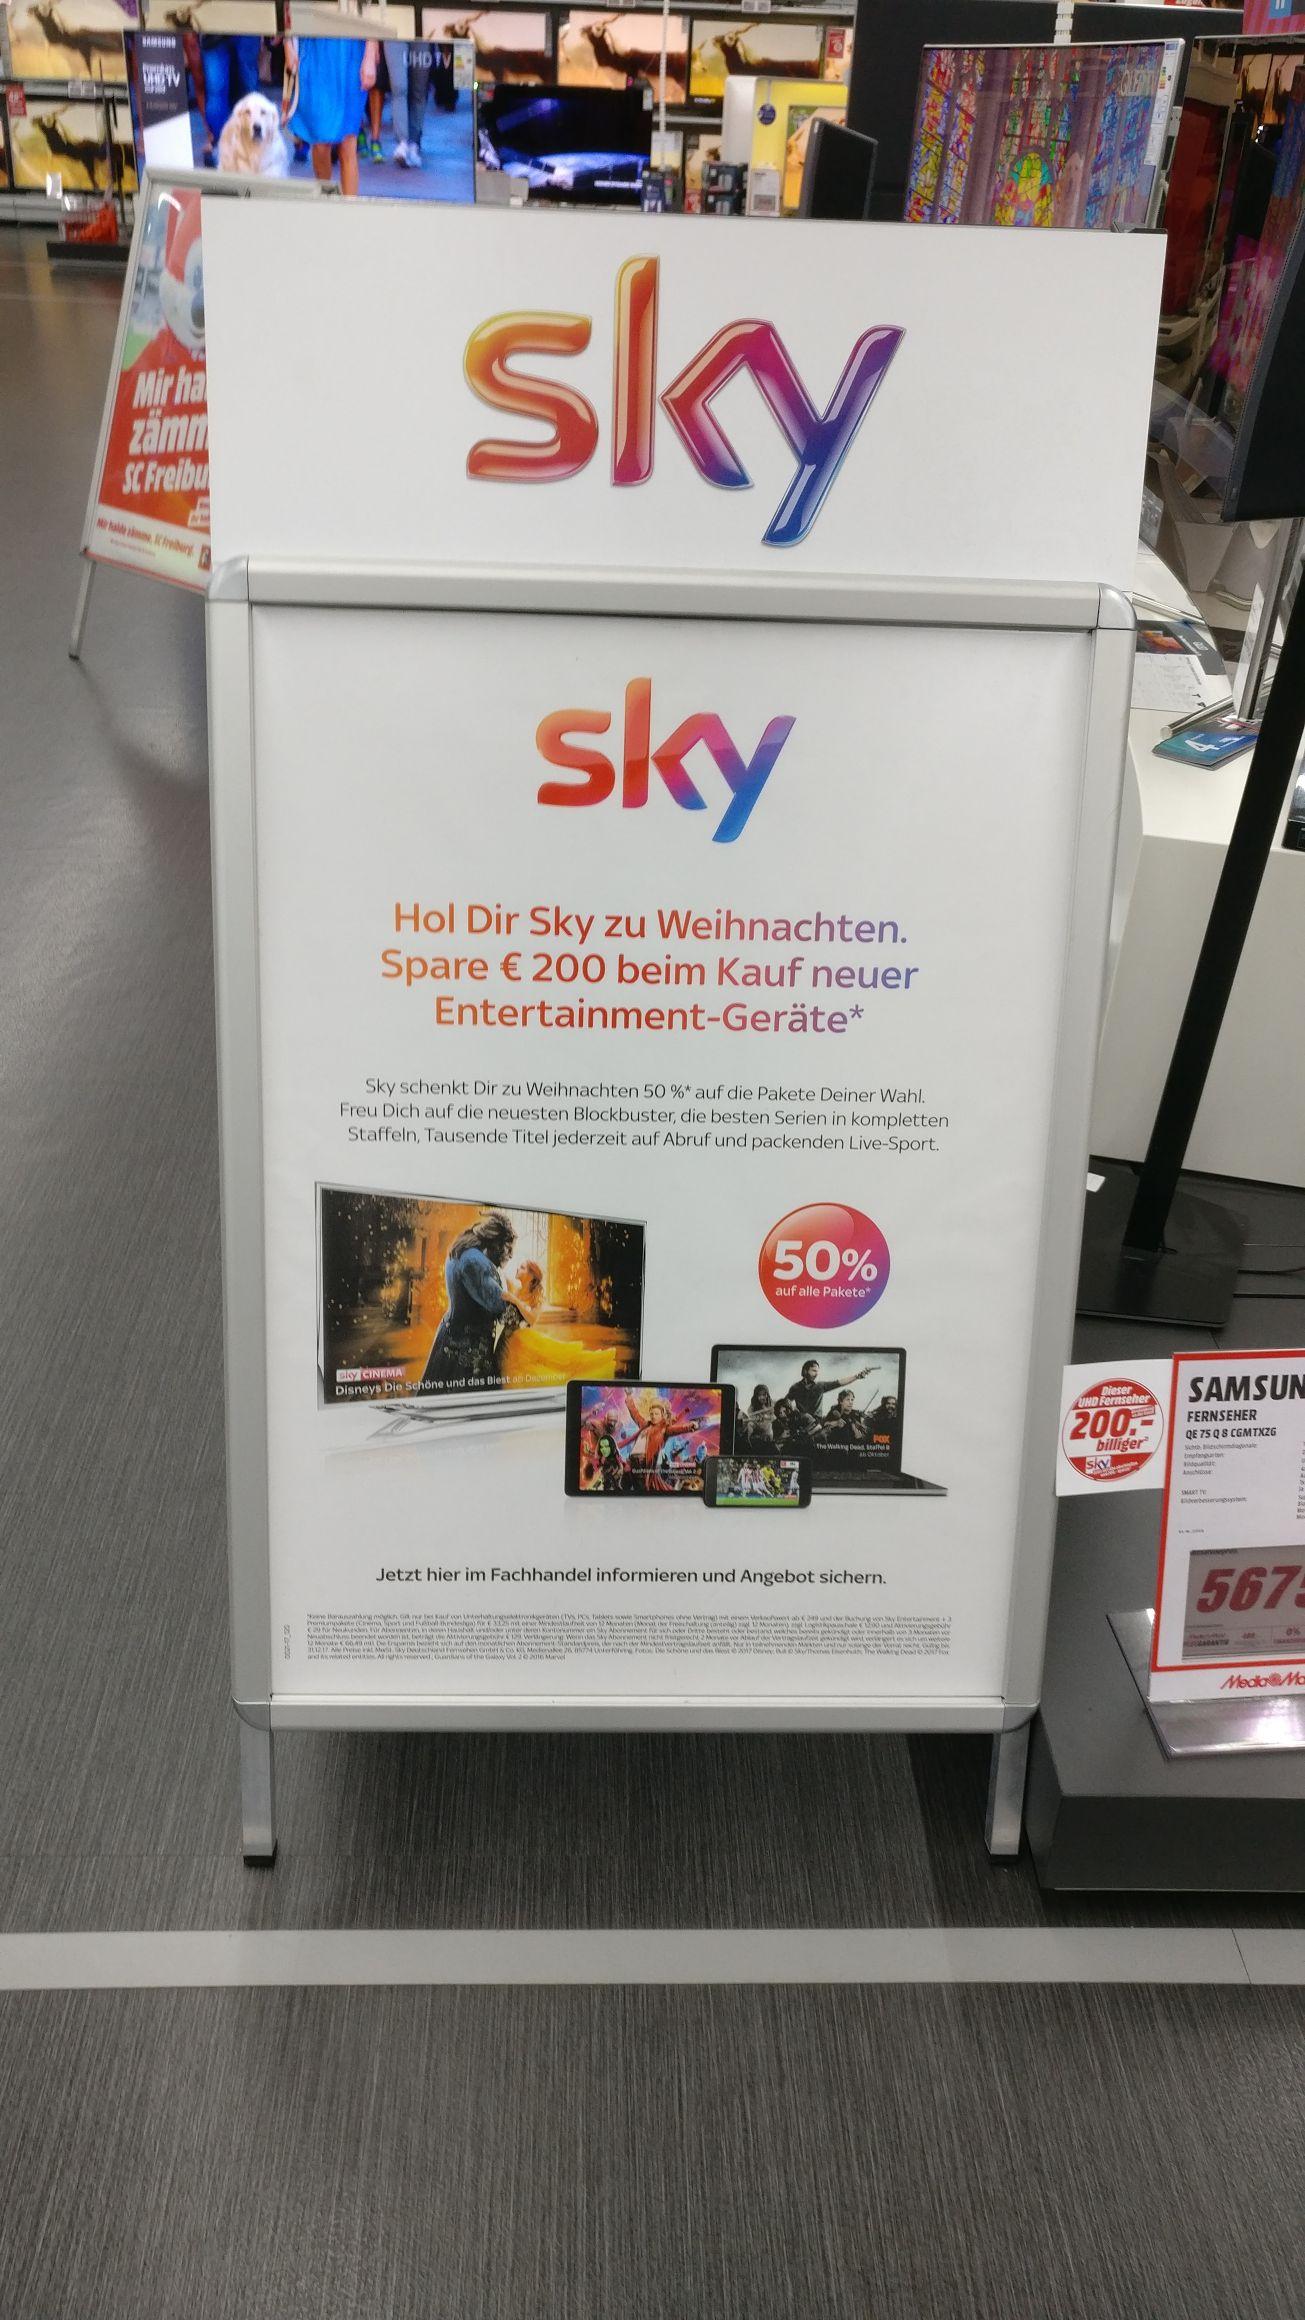 Lokal Media Markt Freiburg Sky Angebot Komplett Paket 35,99 Inkl. HD